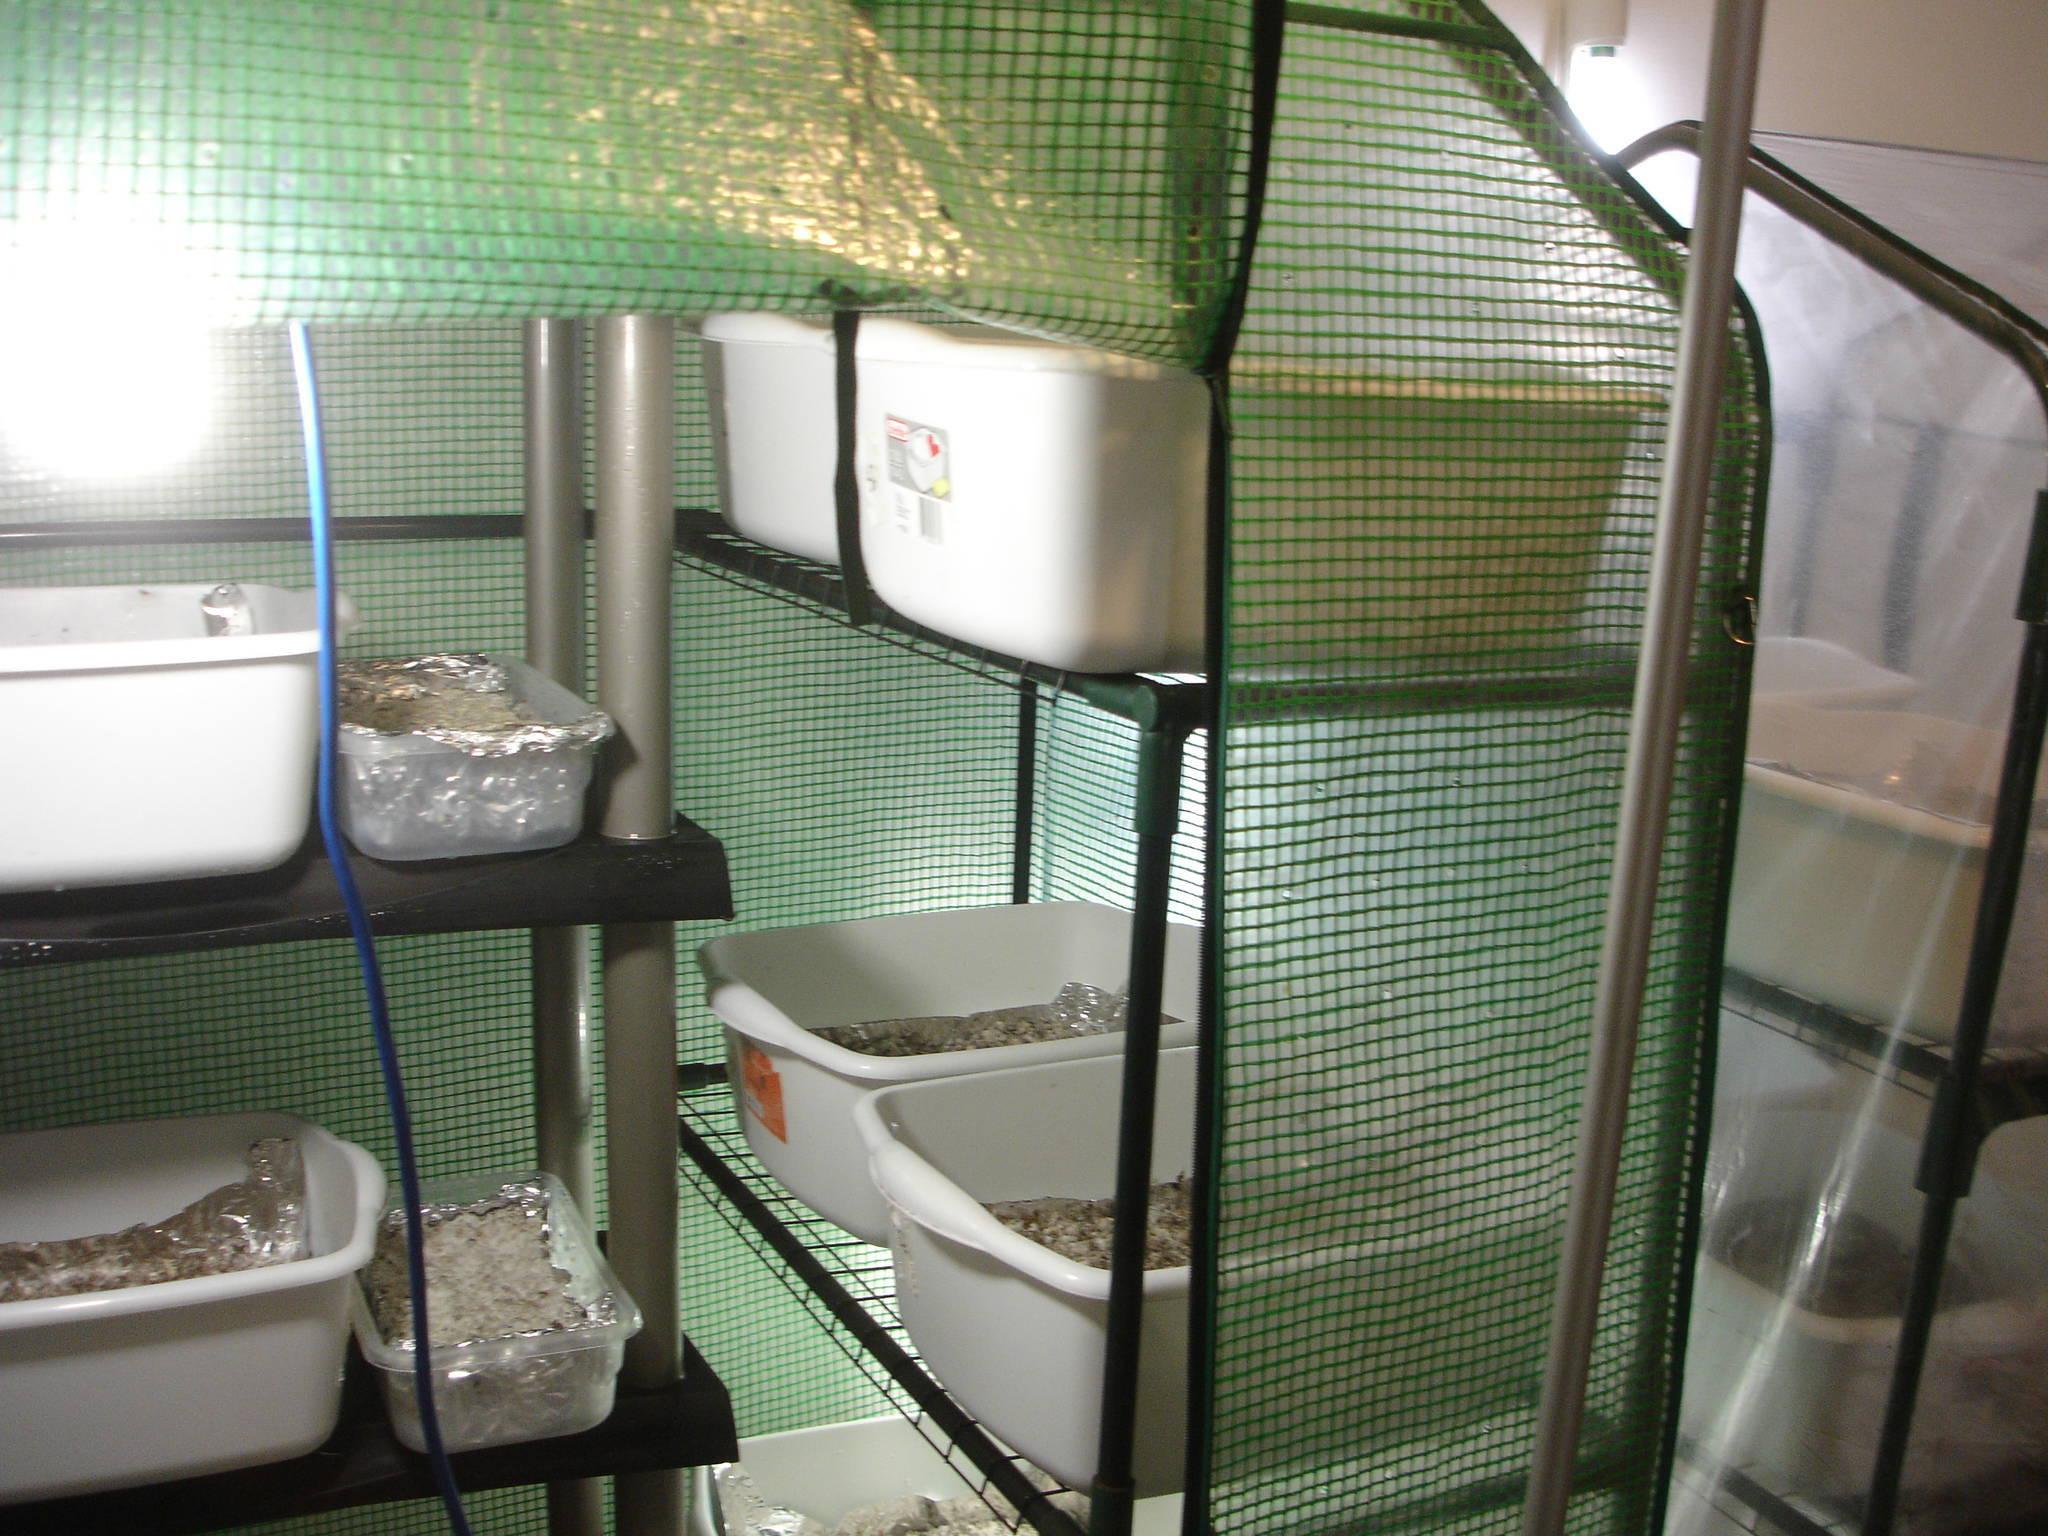 Greenhouse humidity FAE Pinning Mushroom Cultivation Shroomery  #4D7E6C